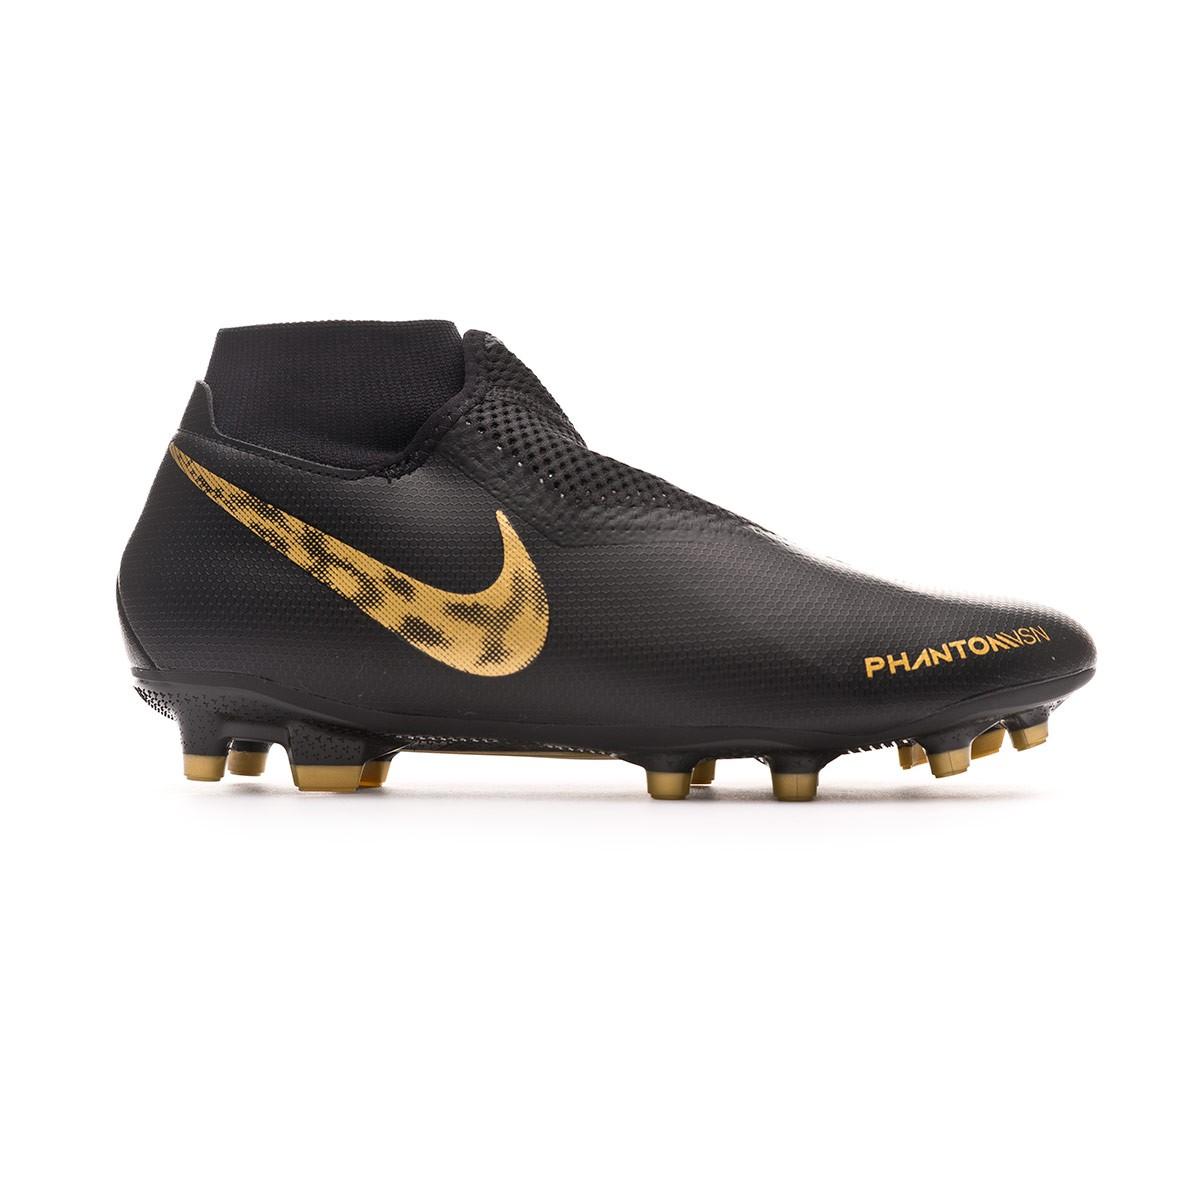 2a84a78e6ae70 Football Boots Nike Phantom Vision Academy DF FG MG Black-Metallic vivid  gold - Tienda de fútbol Fútbol Emotion